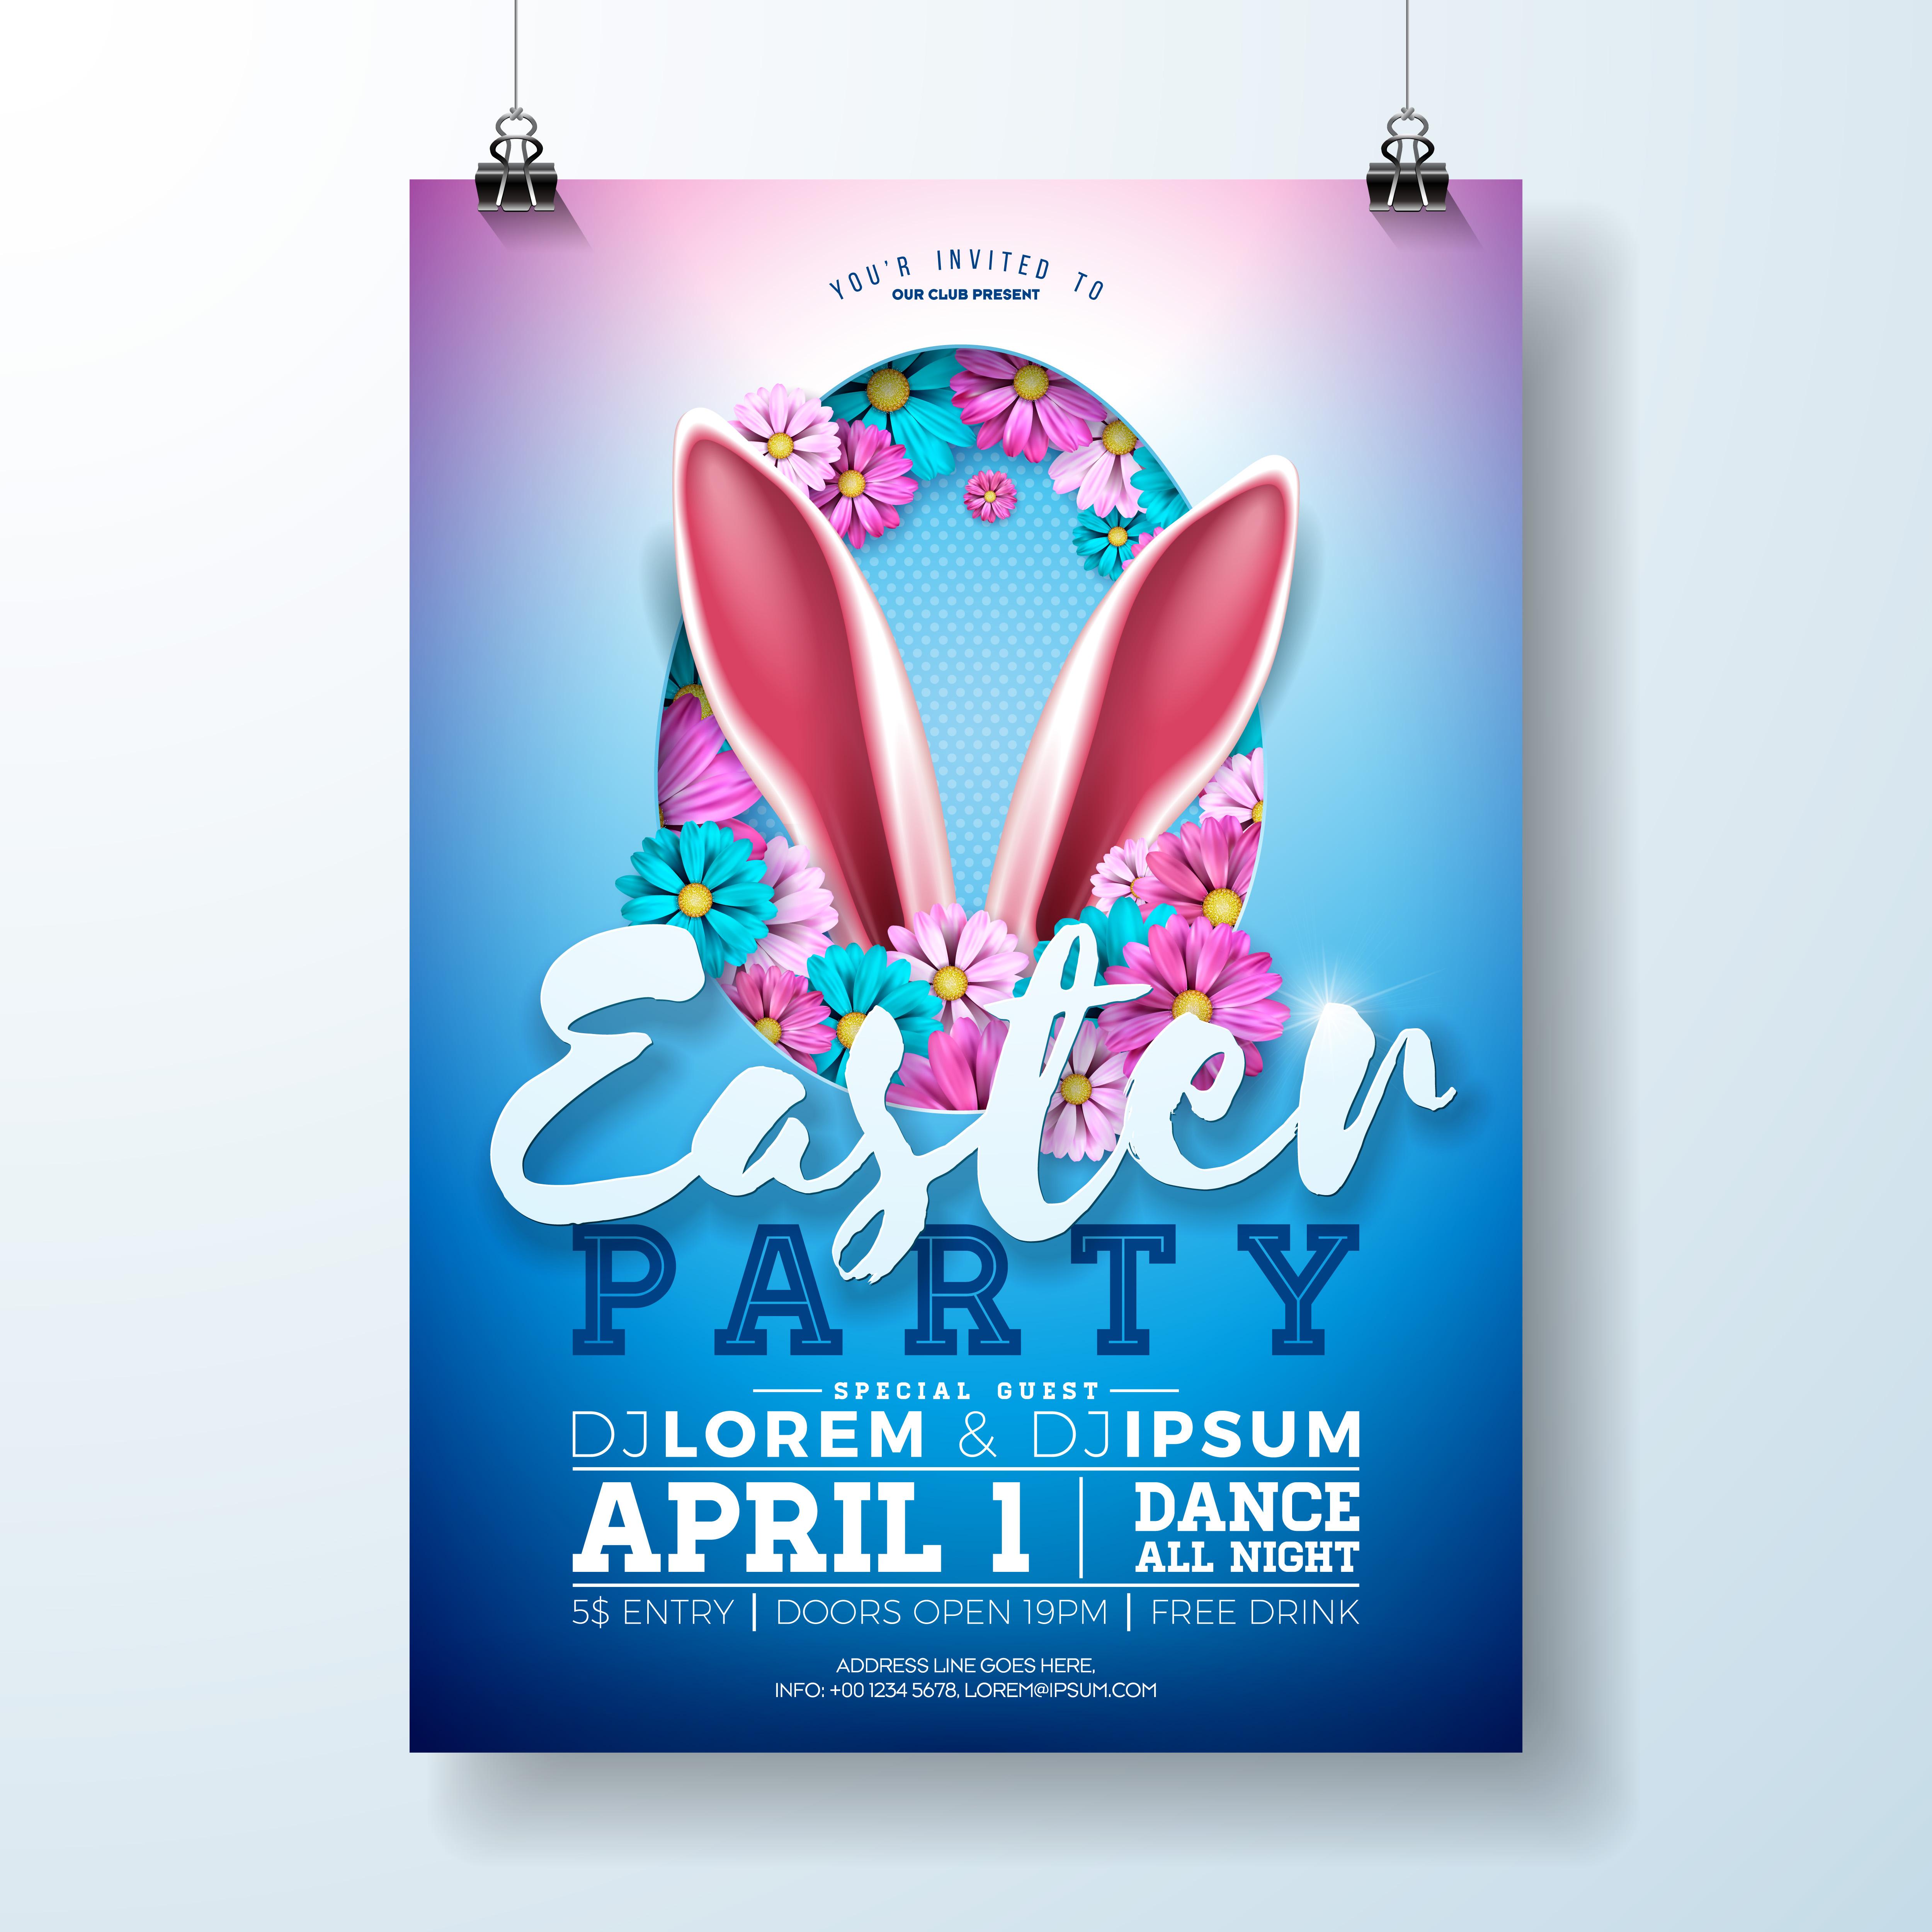 Easter Flyer Free Vector Art - (211 Free Downloads)